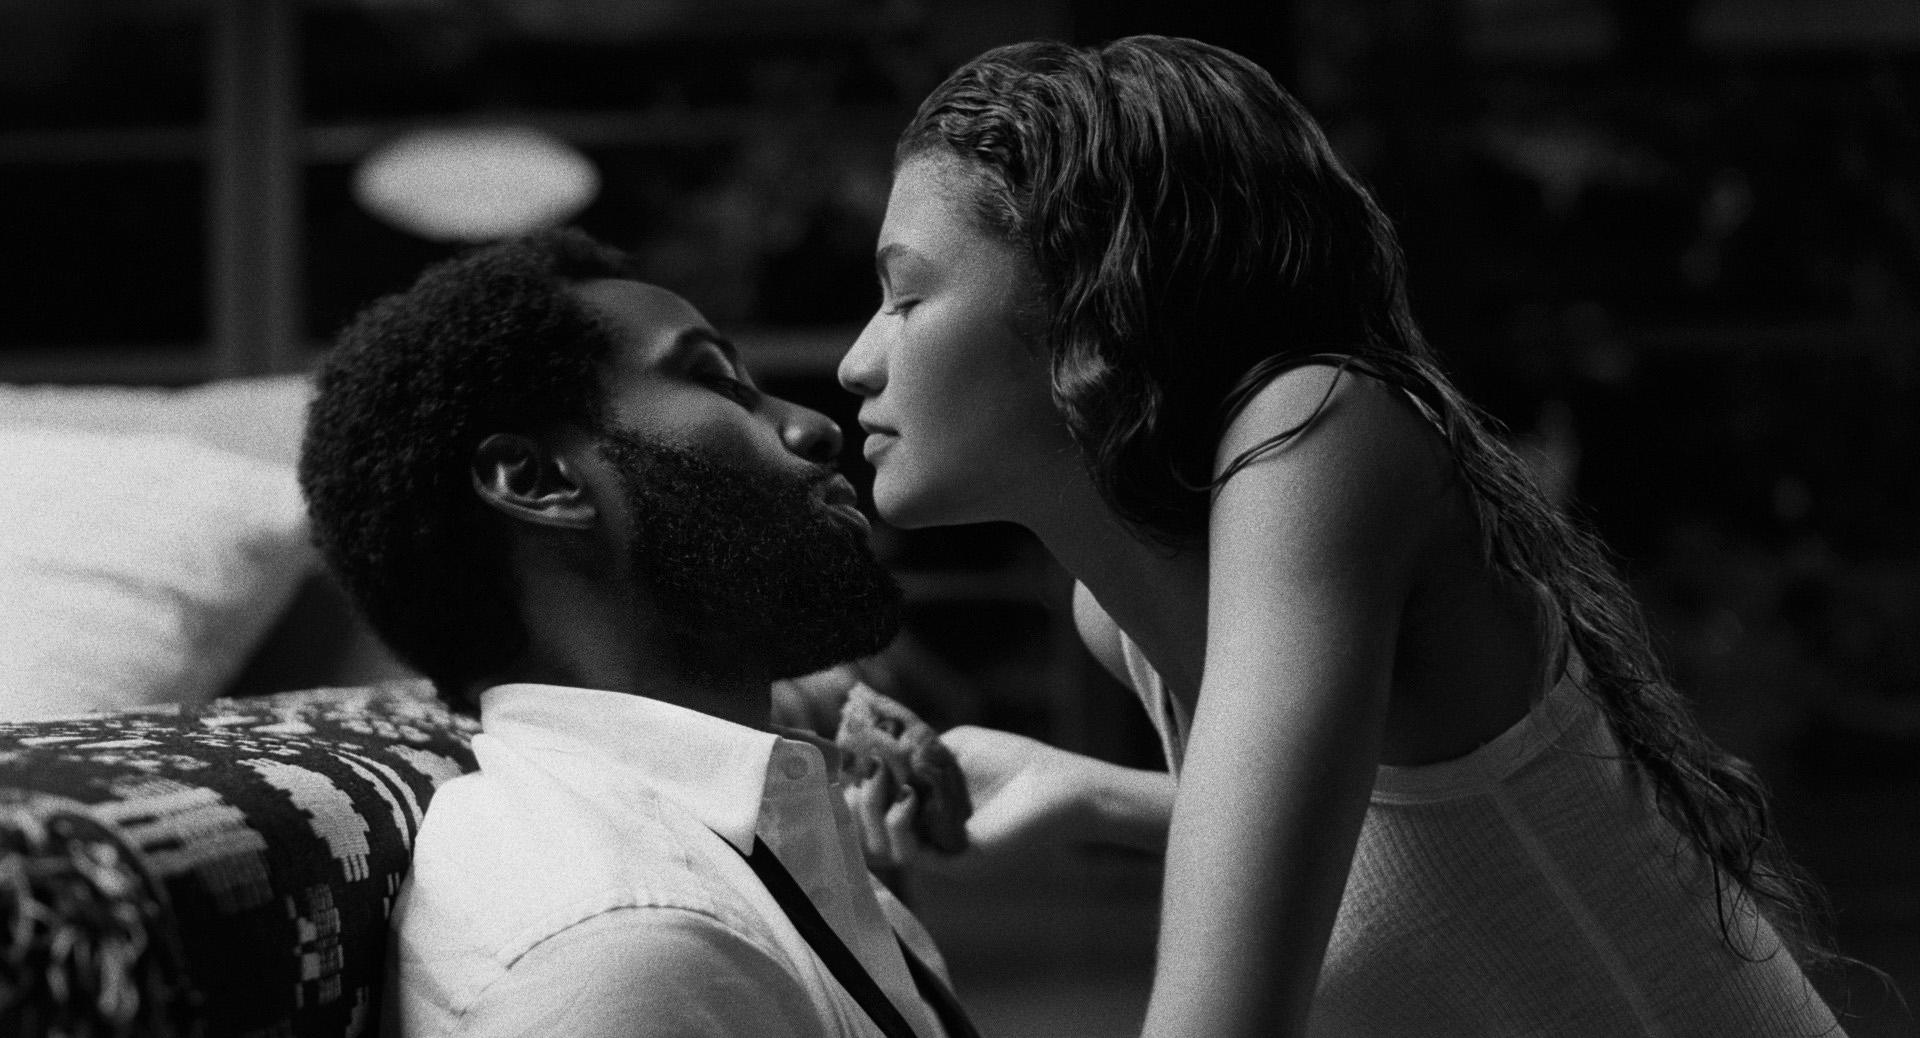 John David Washington and Zendaya play Malcolm & Marie.